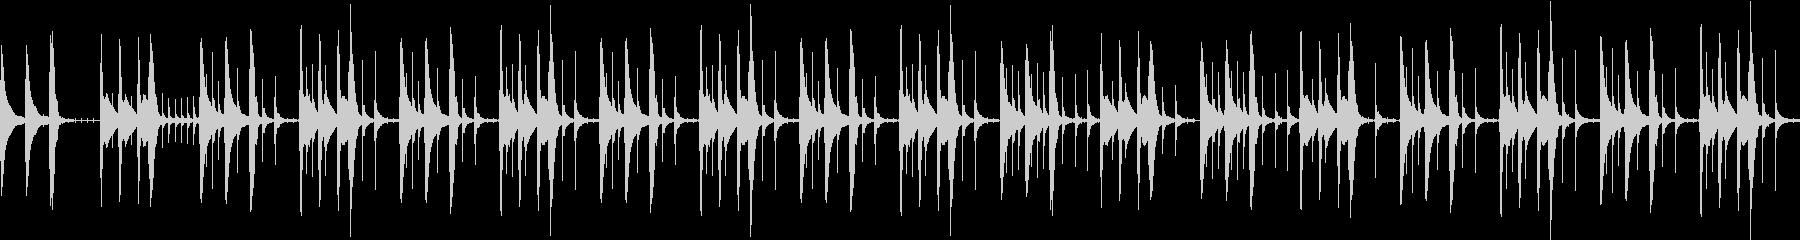 DIY早送り映像イメージした鉄琴ポップスの未再生の波形